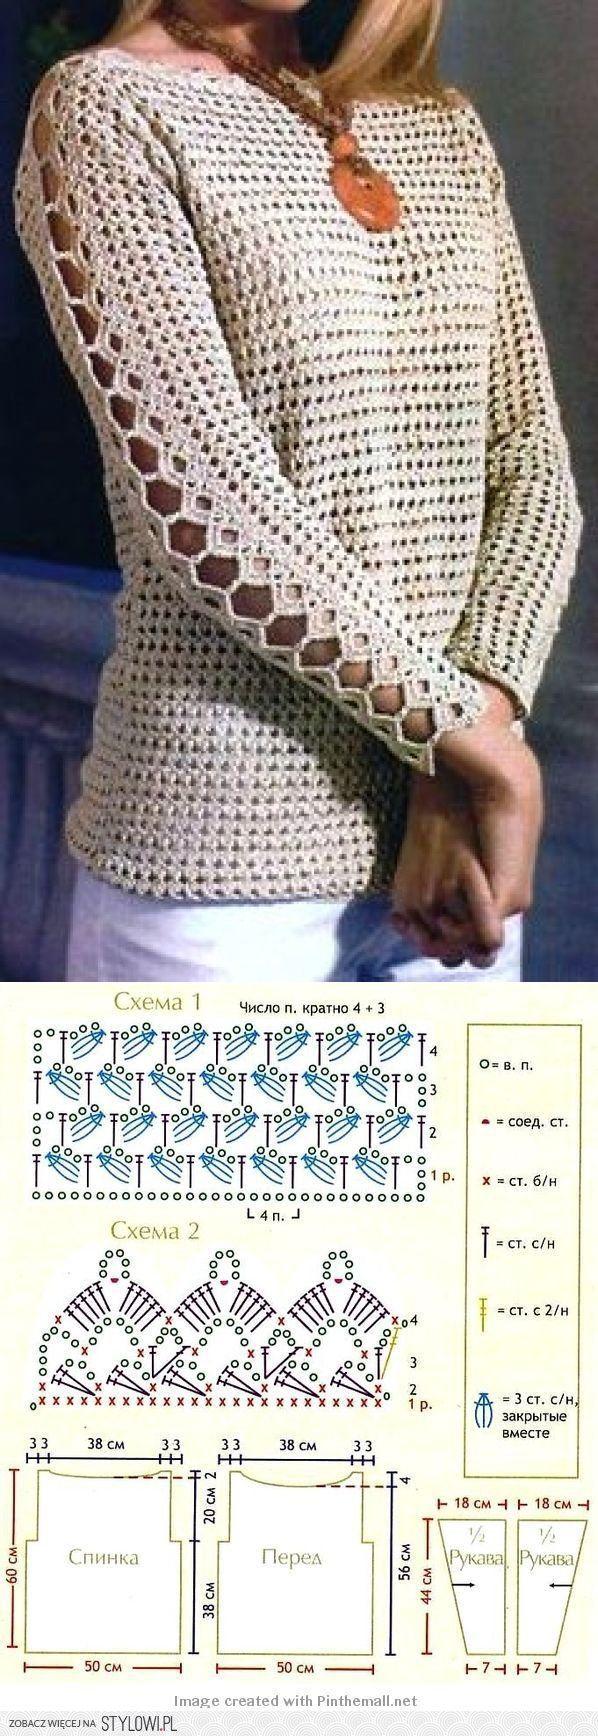 312 best stricken images on Pinterest | Crochet tops, Granny squares ...